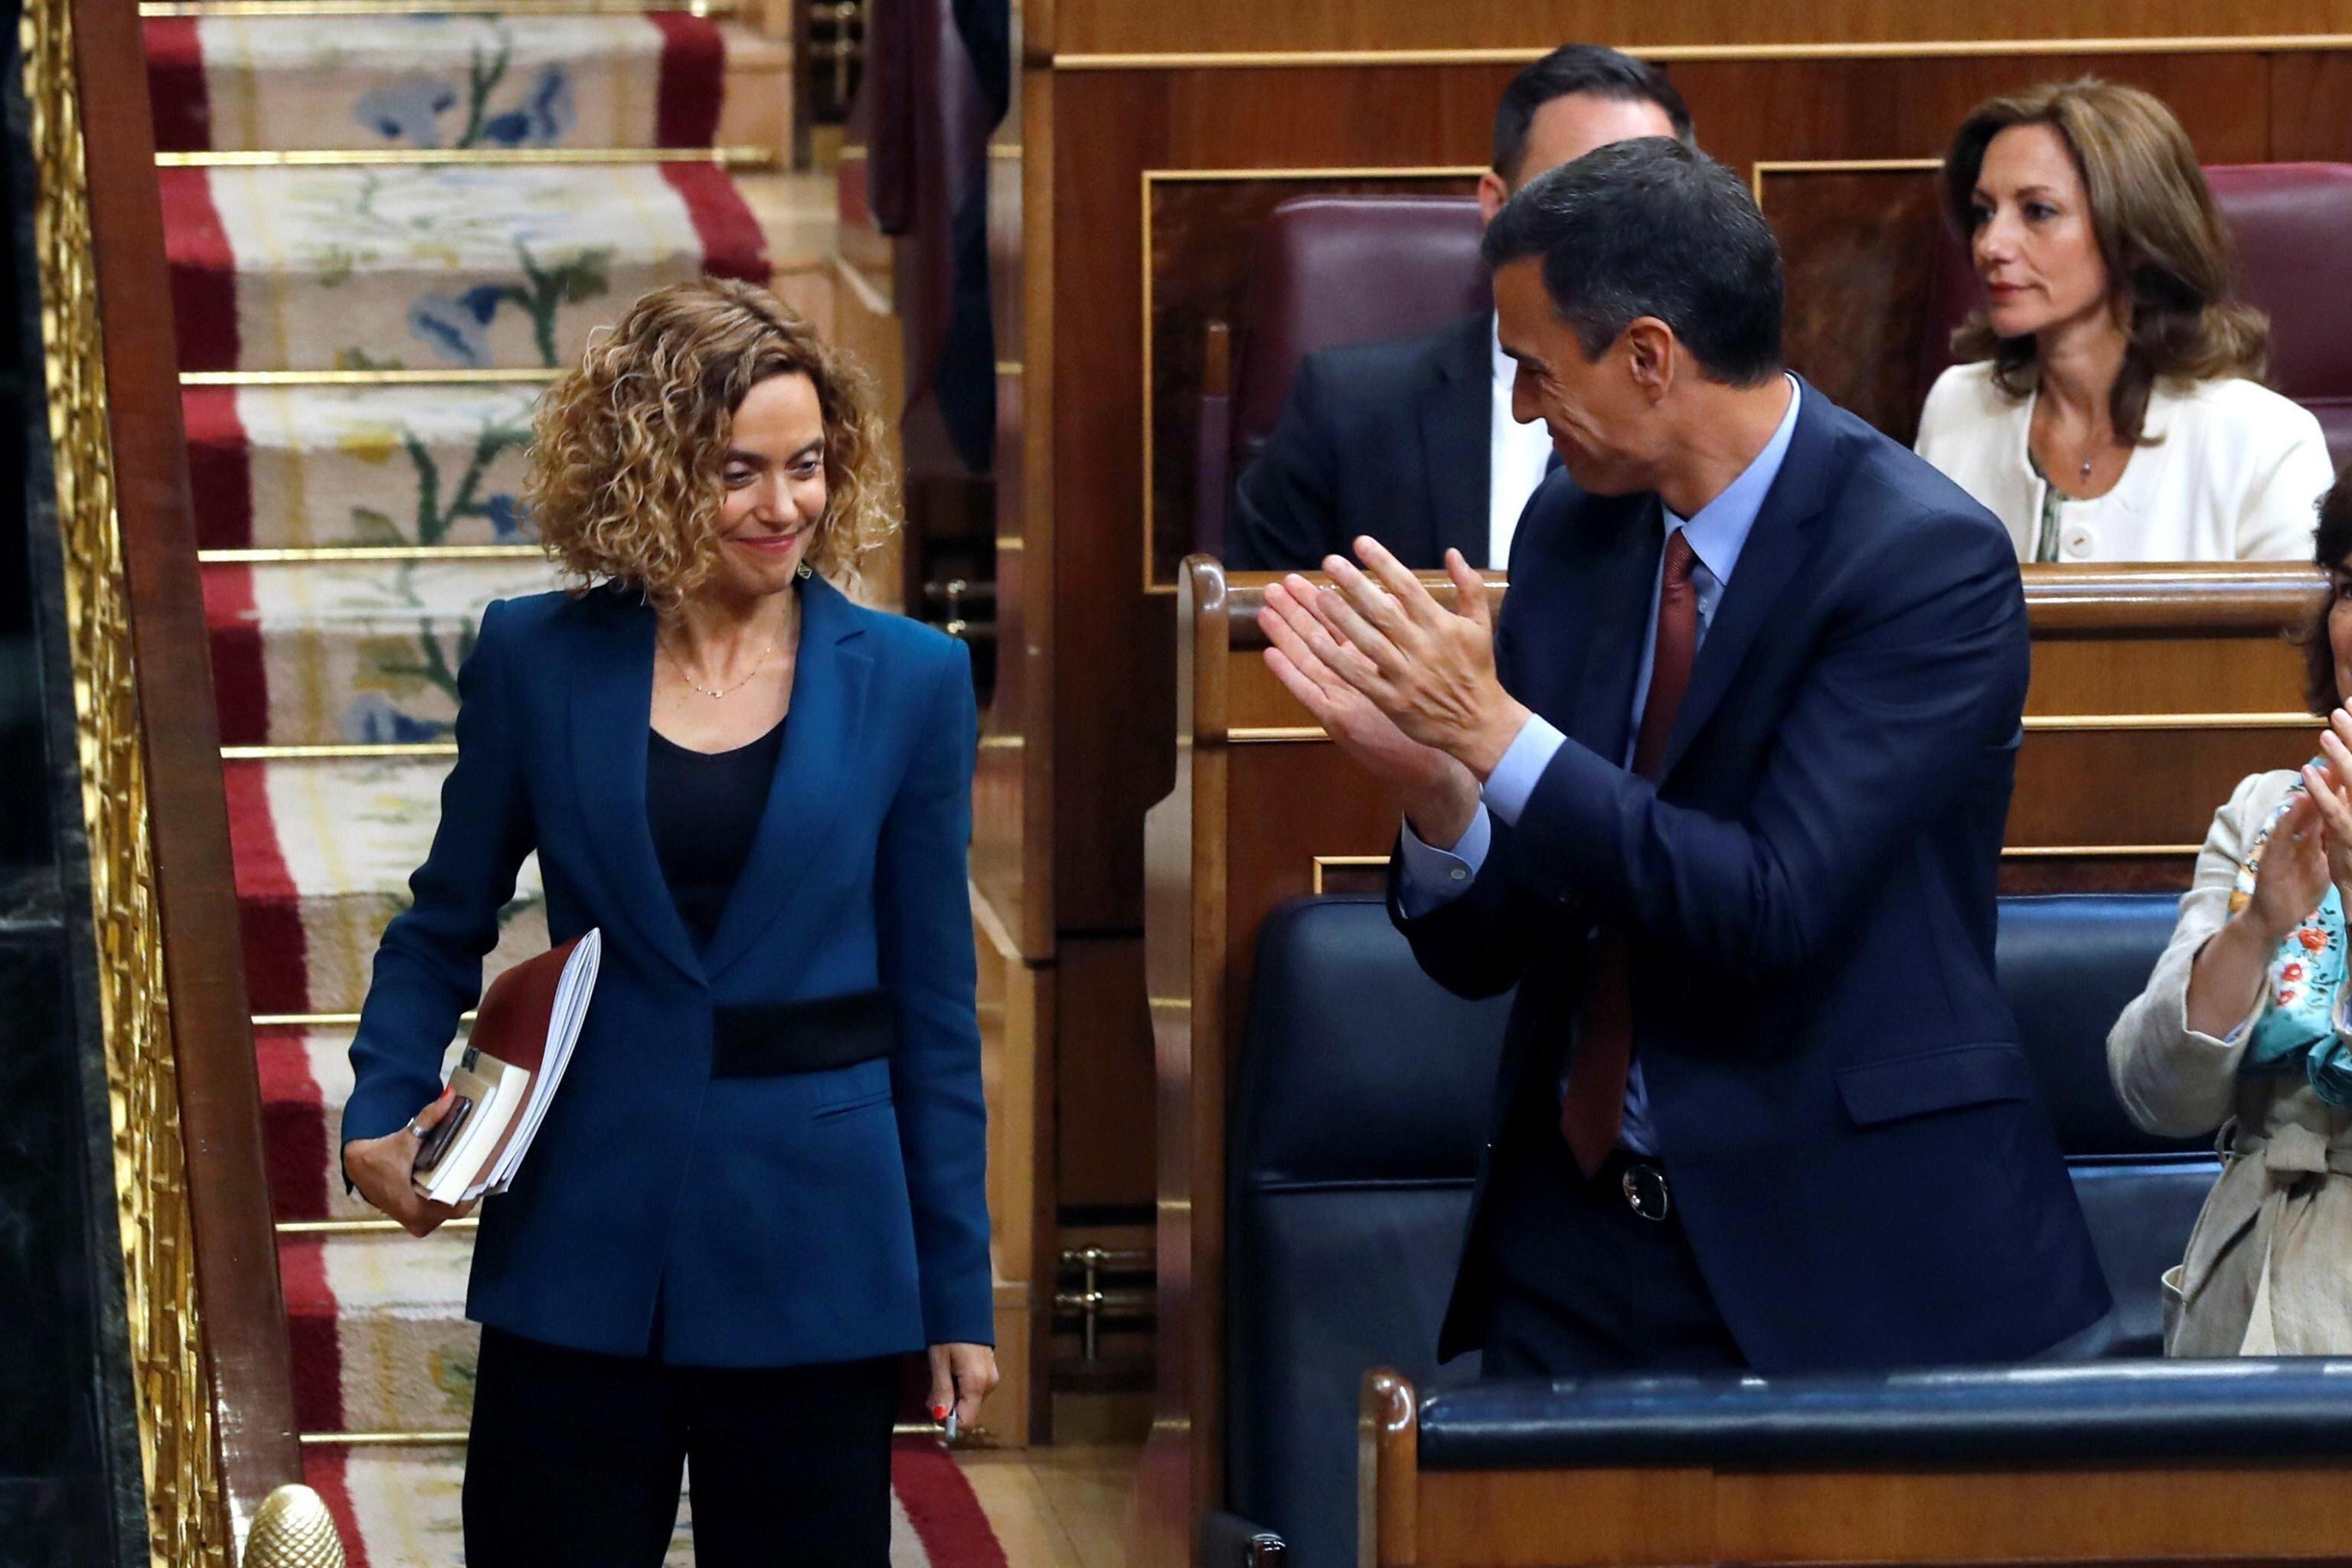 Si inaugurano le Cortes: catalani protagonisti assoluti fra